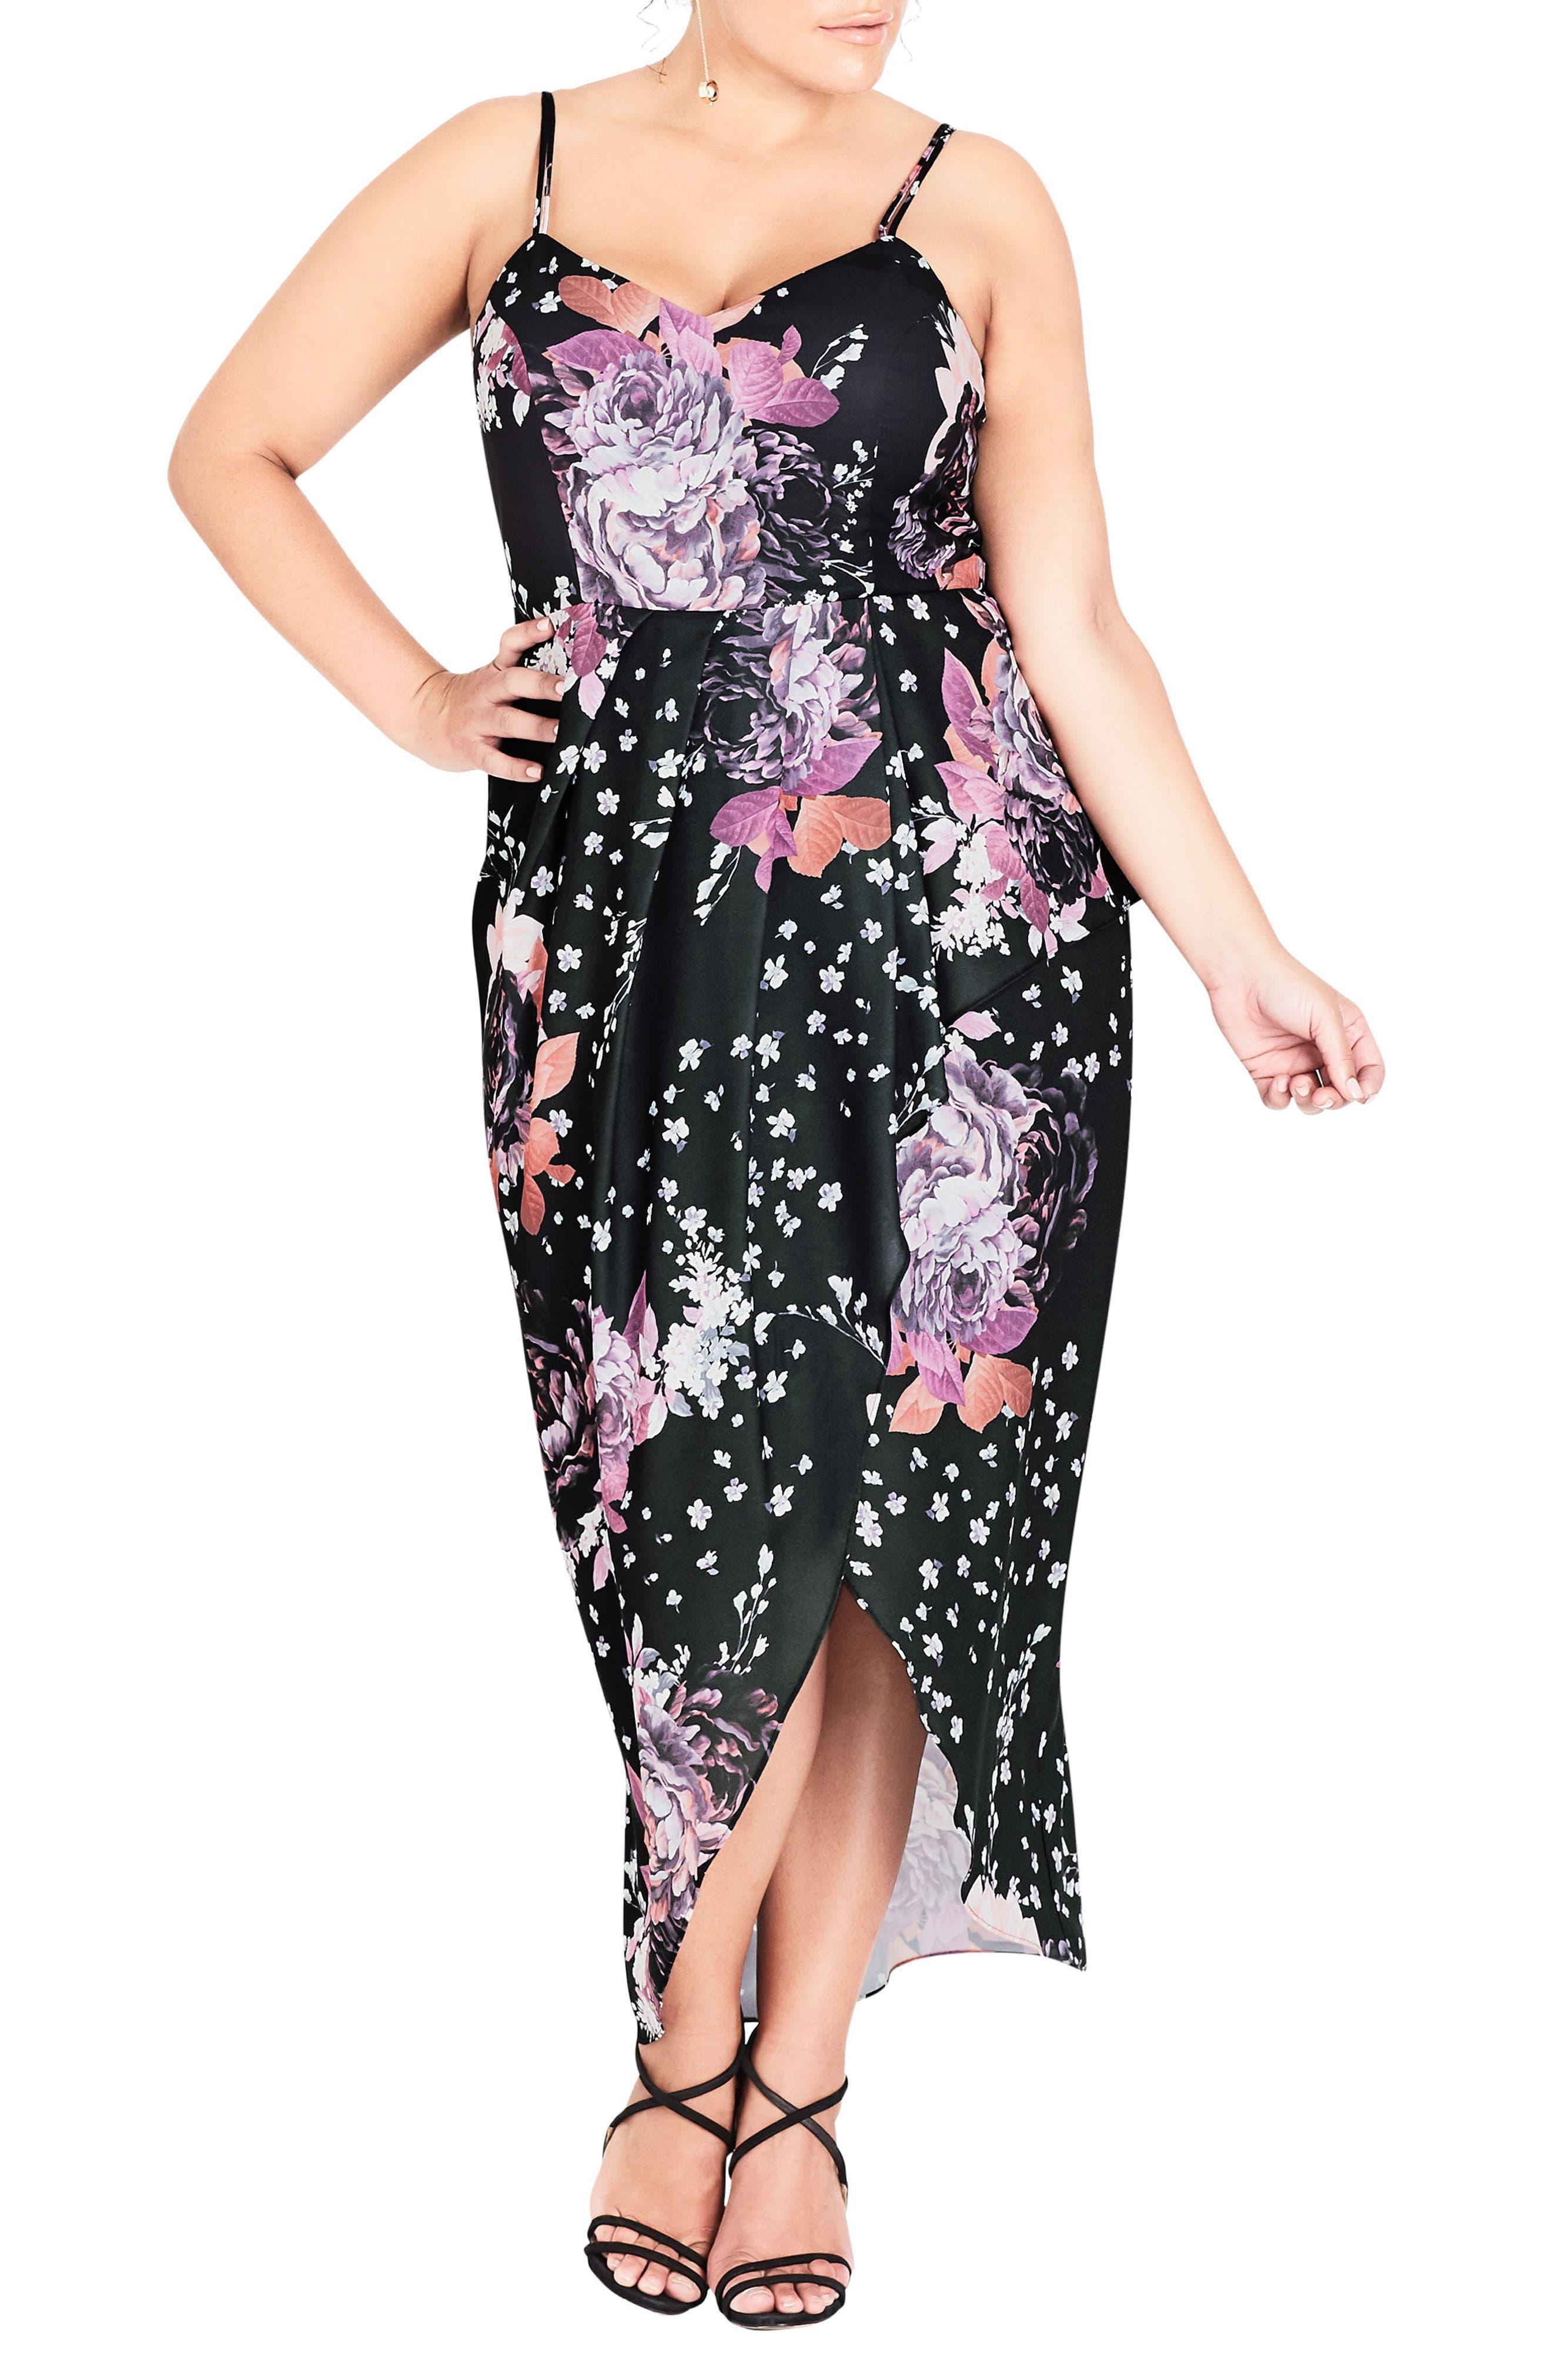 CITY CHIC BLUSH ROSE MAXI DRESS